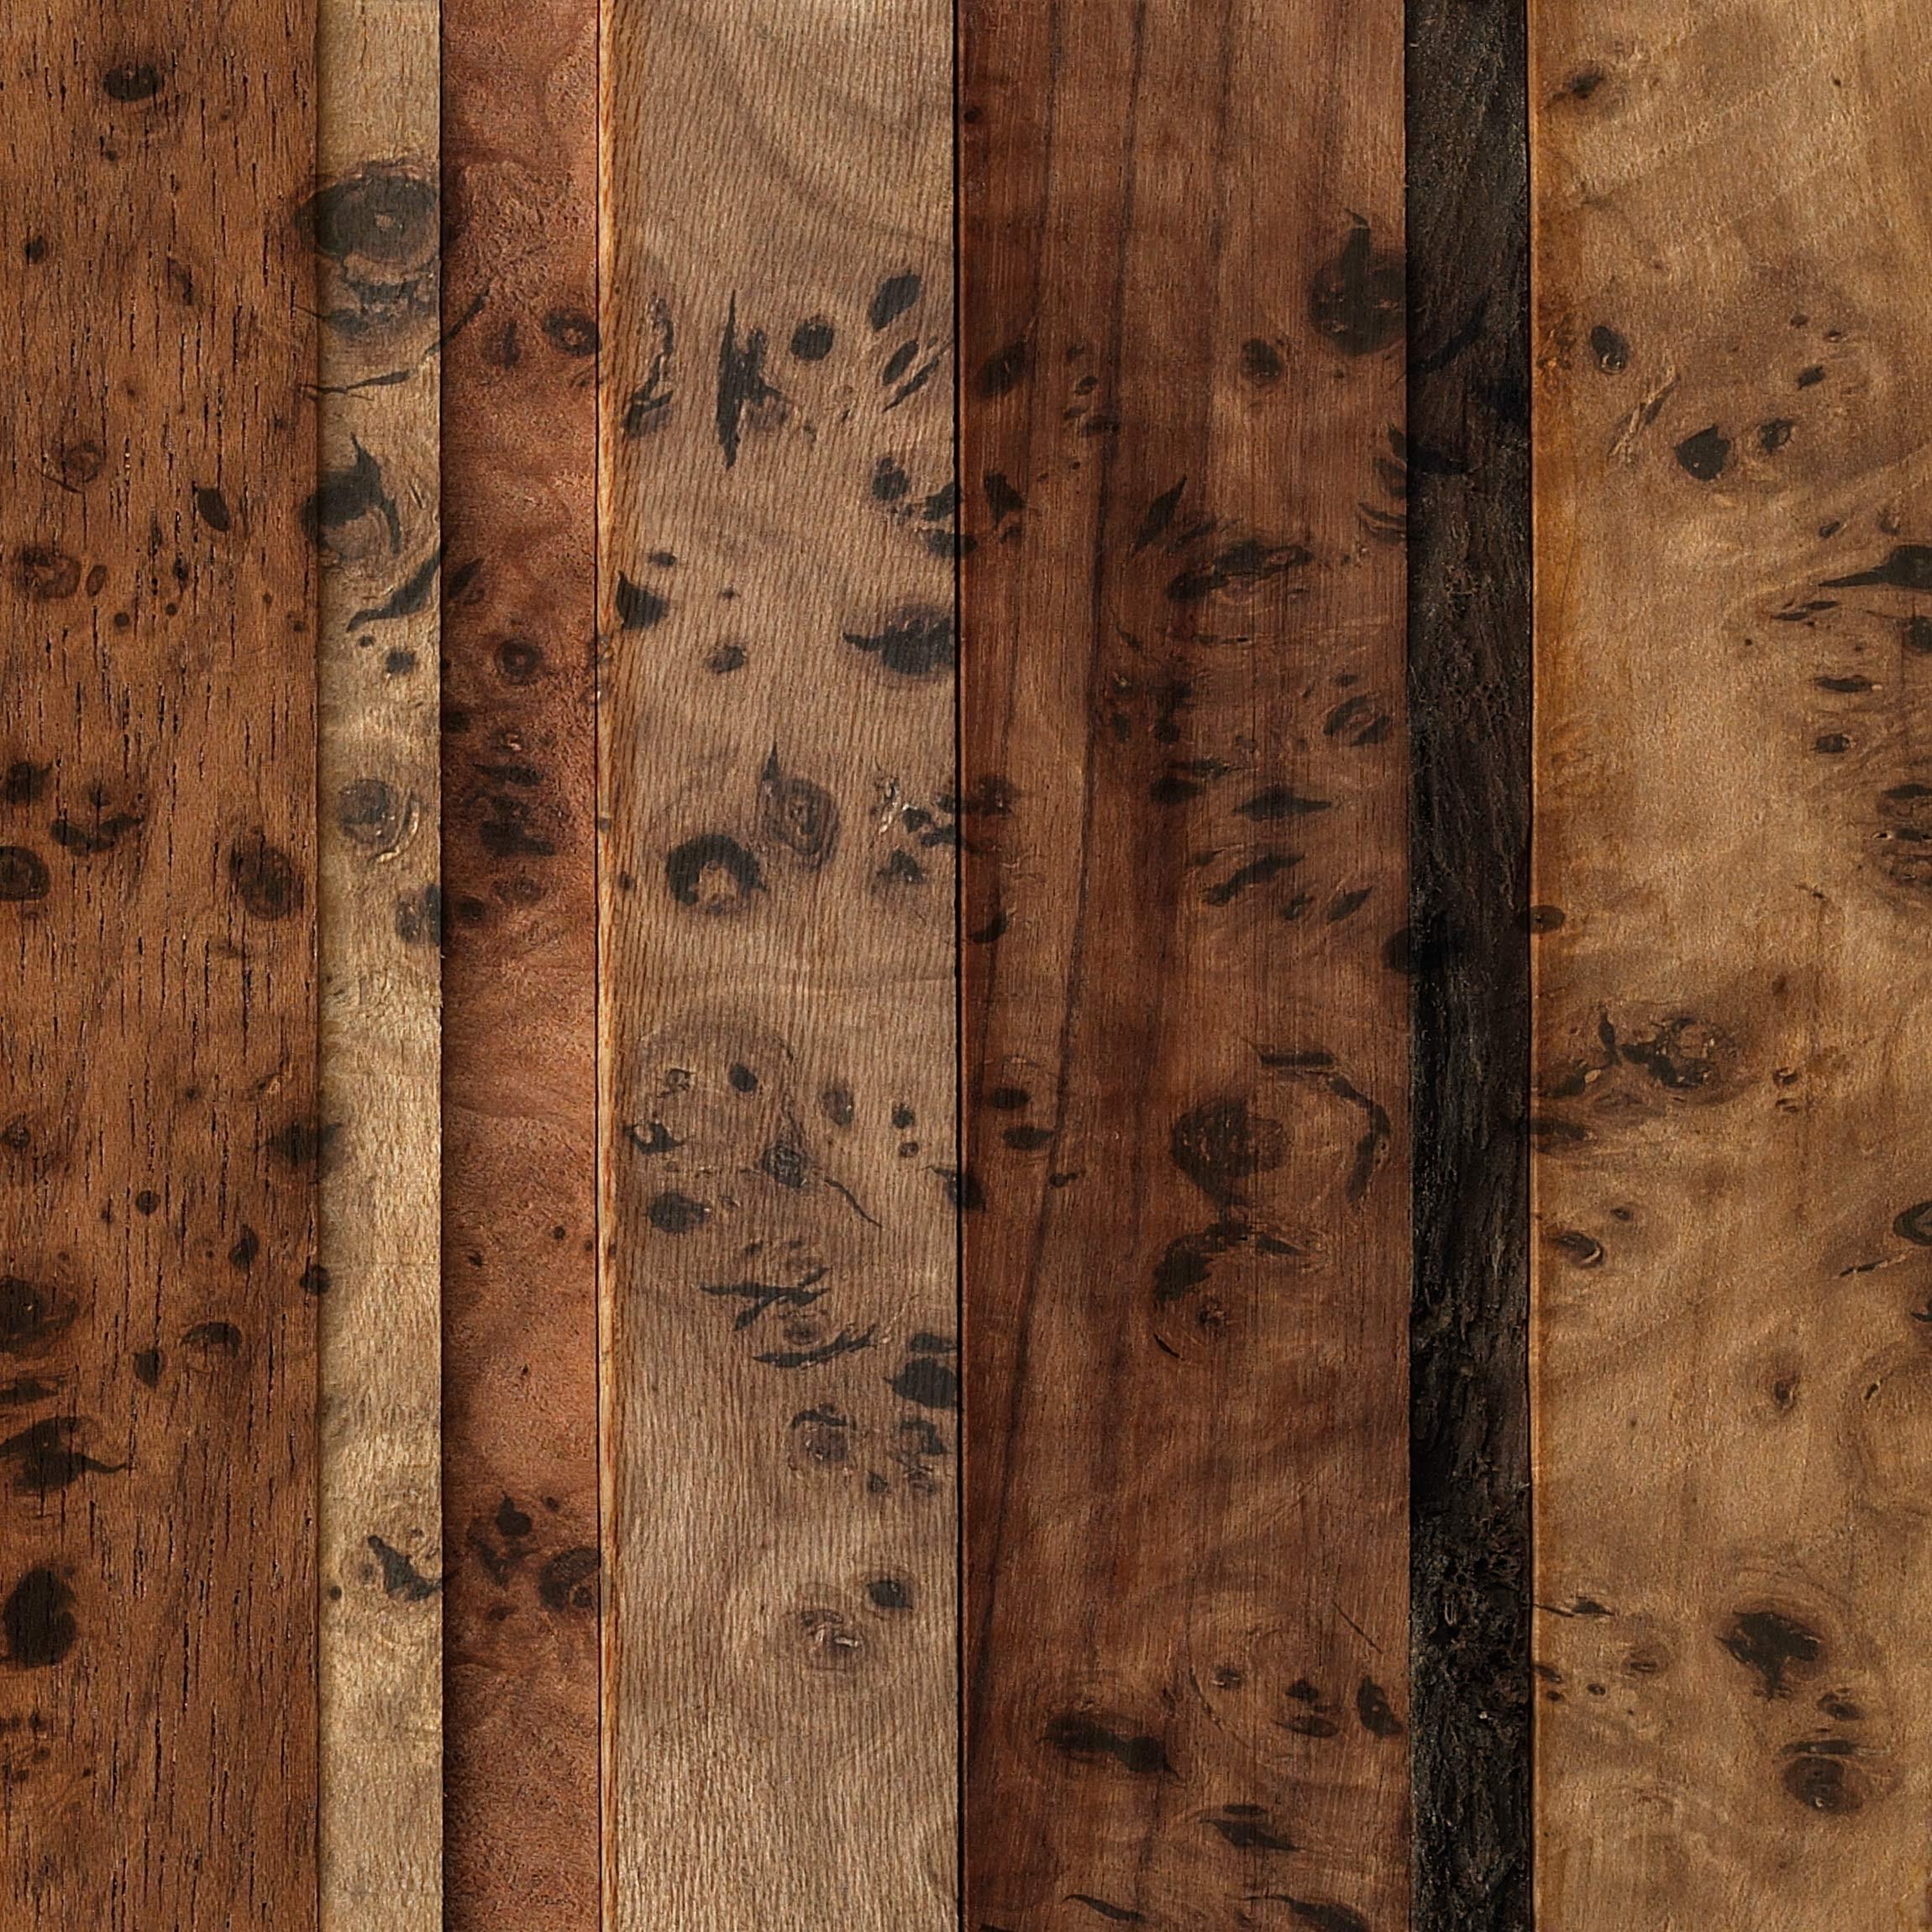 Holzdekorfolie holzwand bird klebefolie holzoptik for Folie mit holzoptik